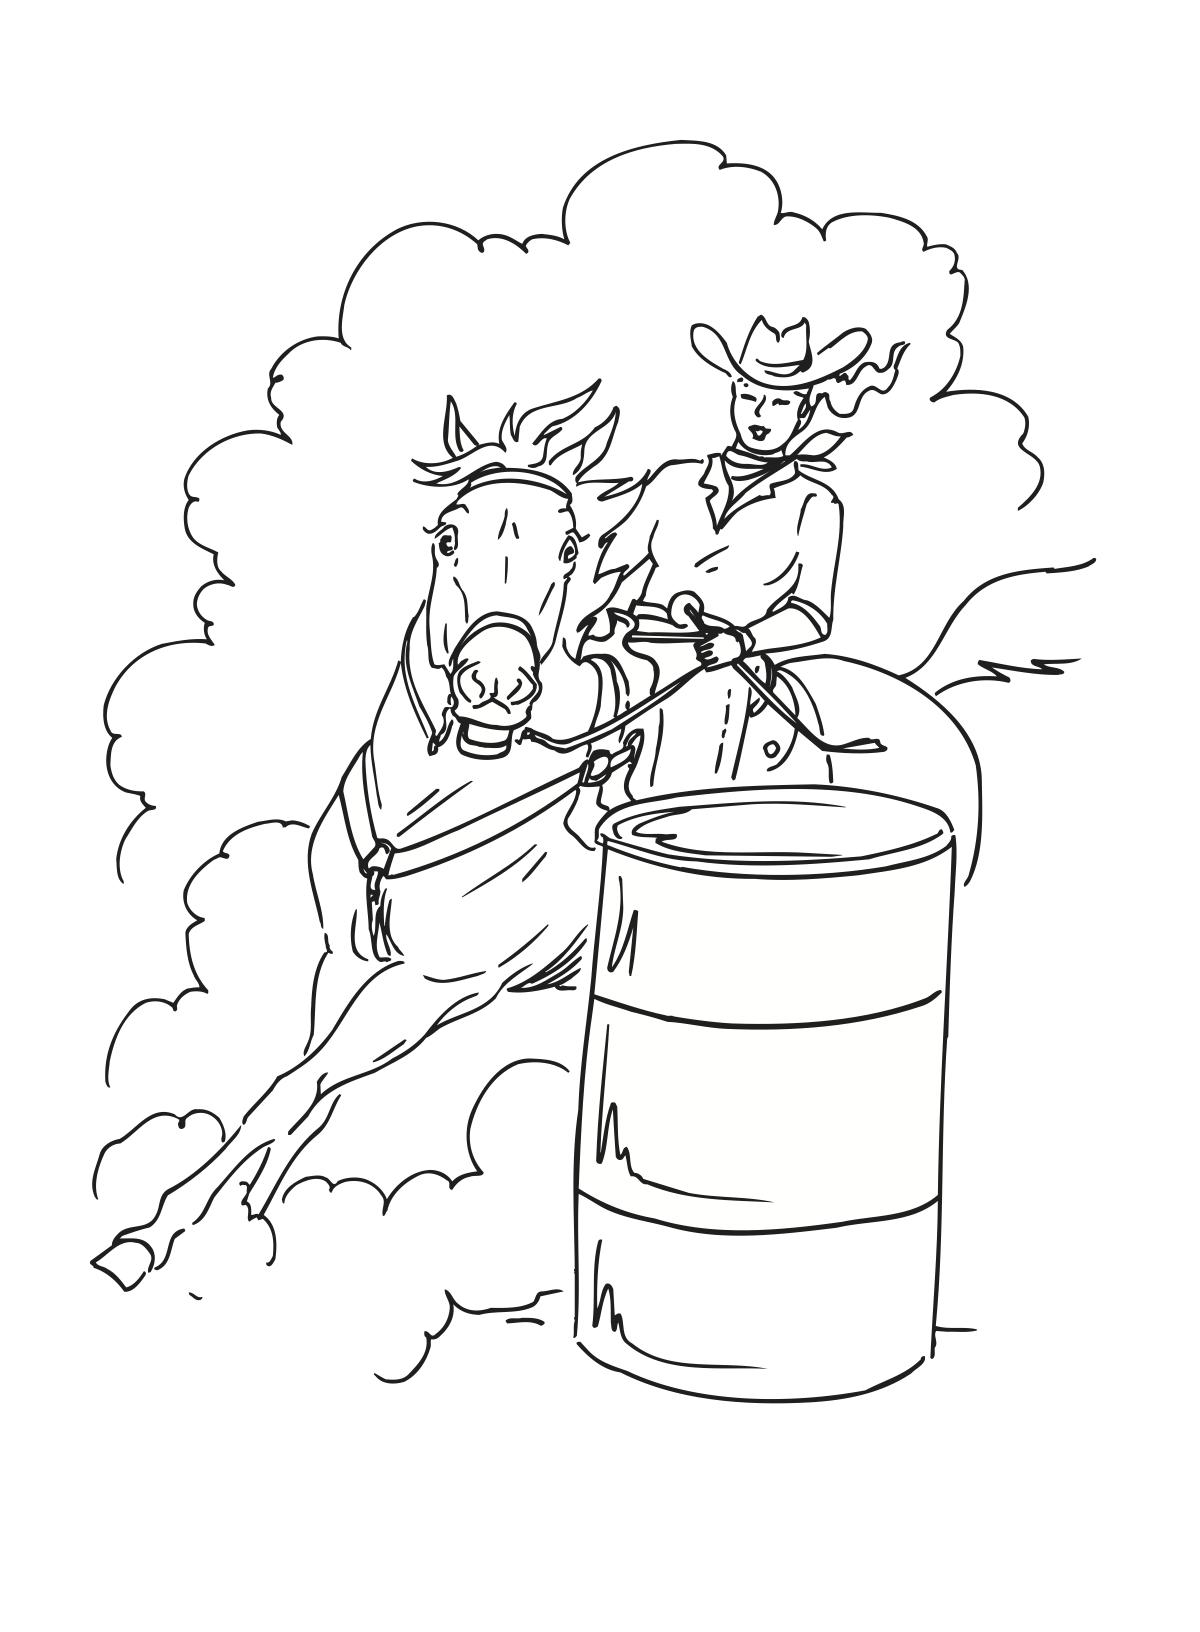 Barrel Racing Drawing At Getdrawings